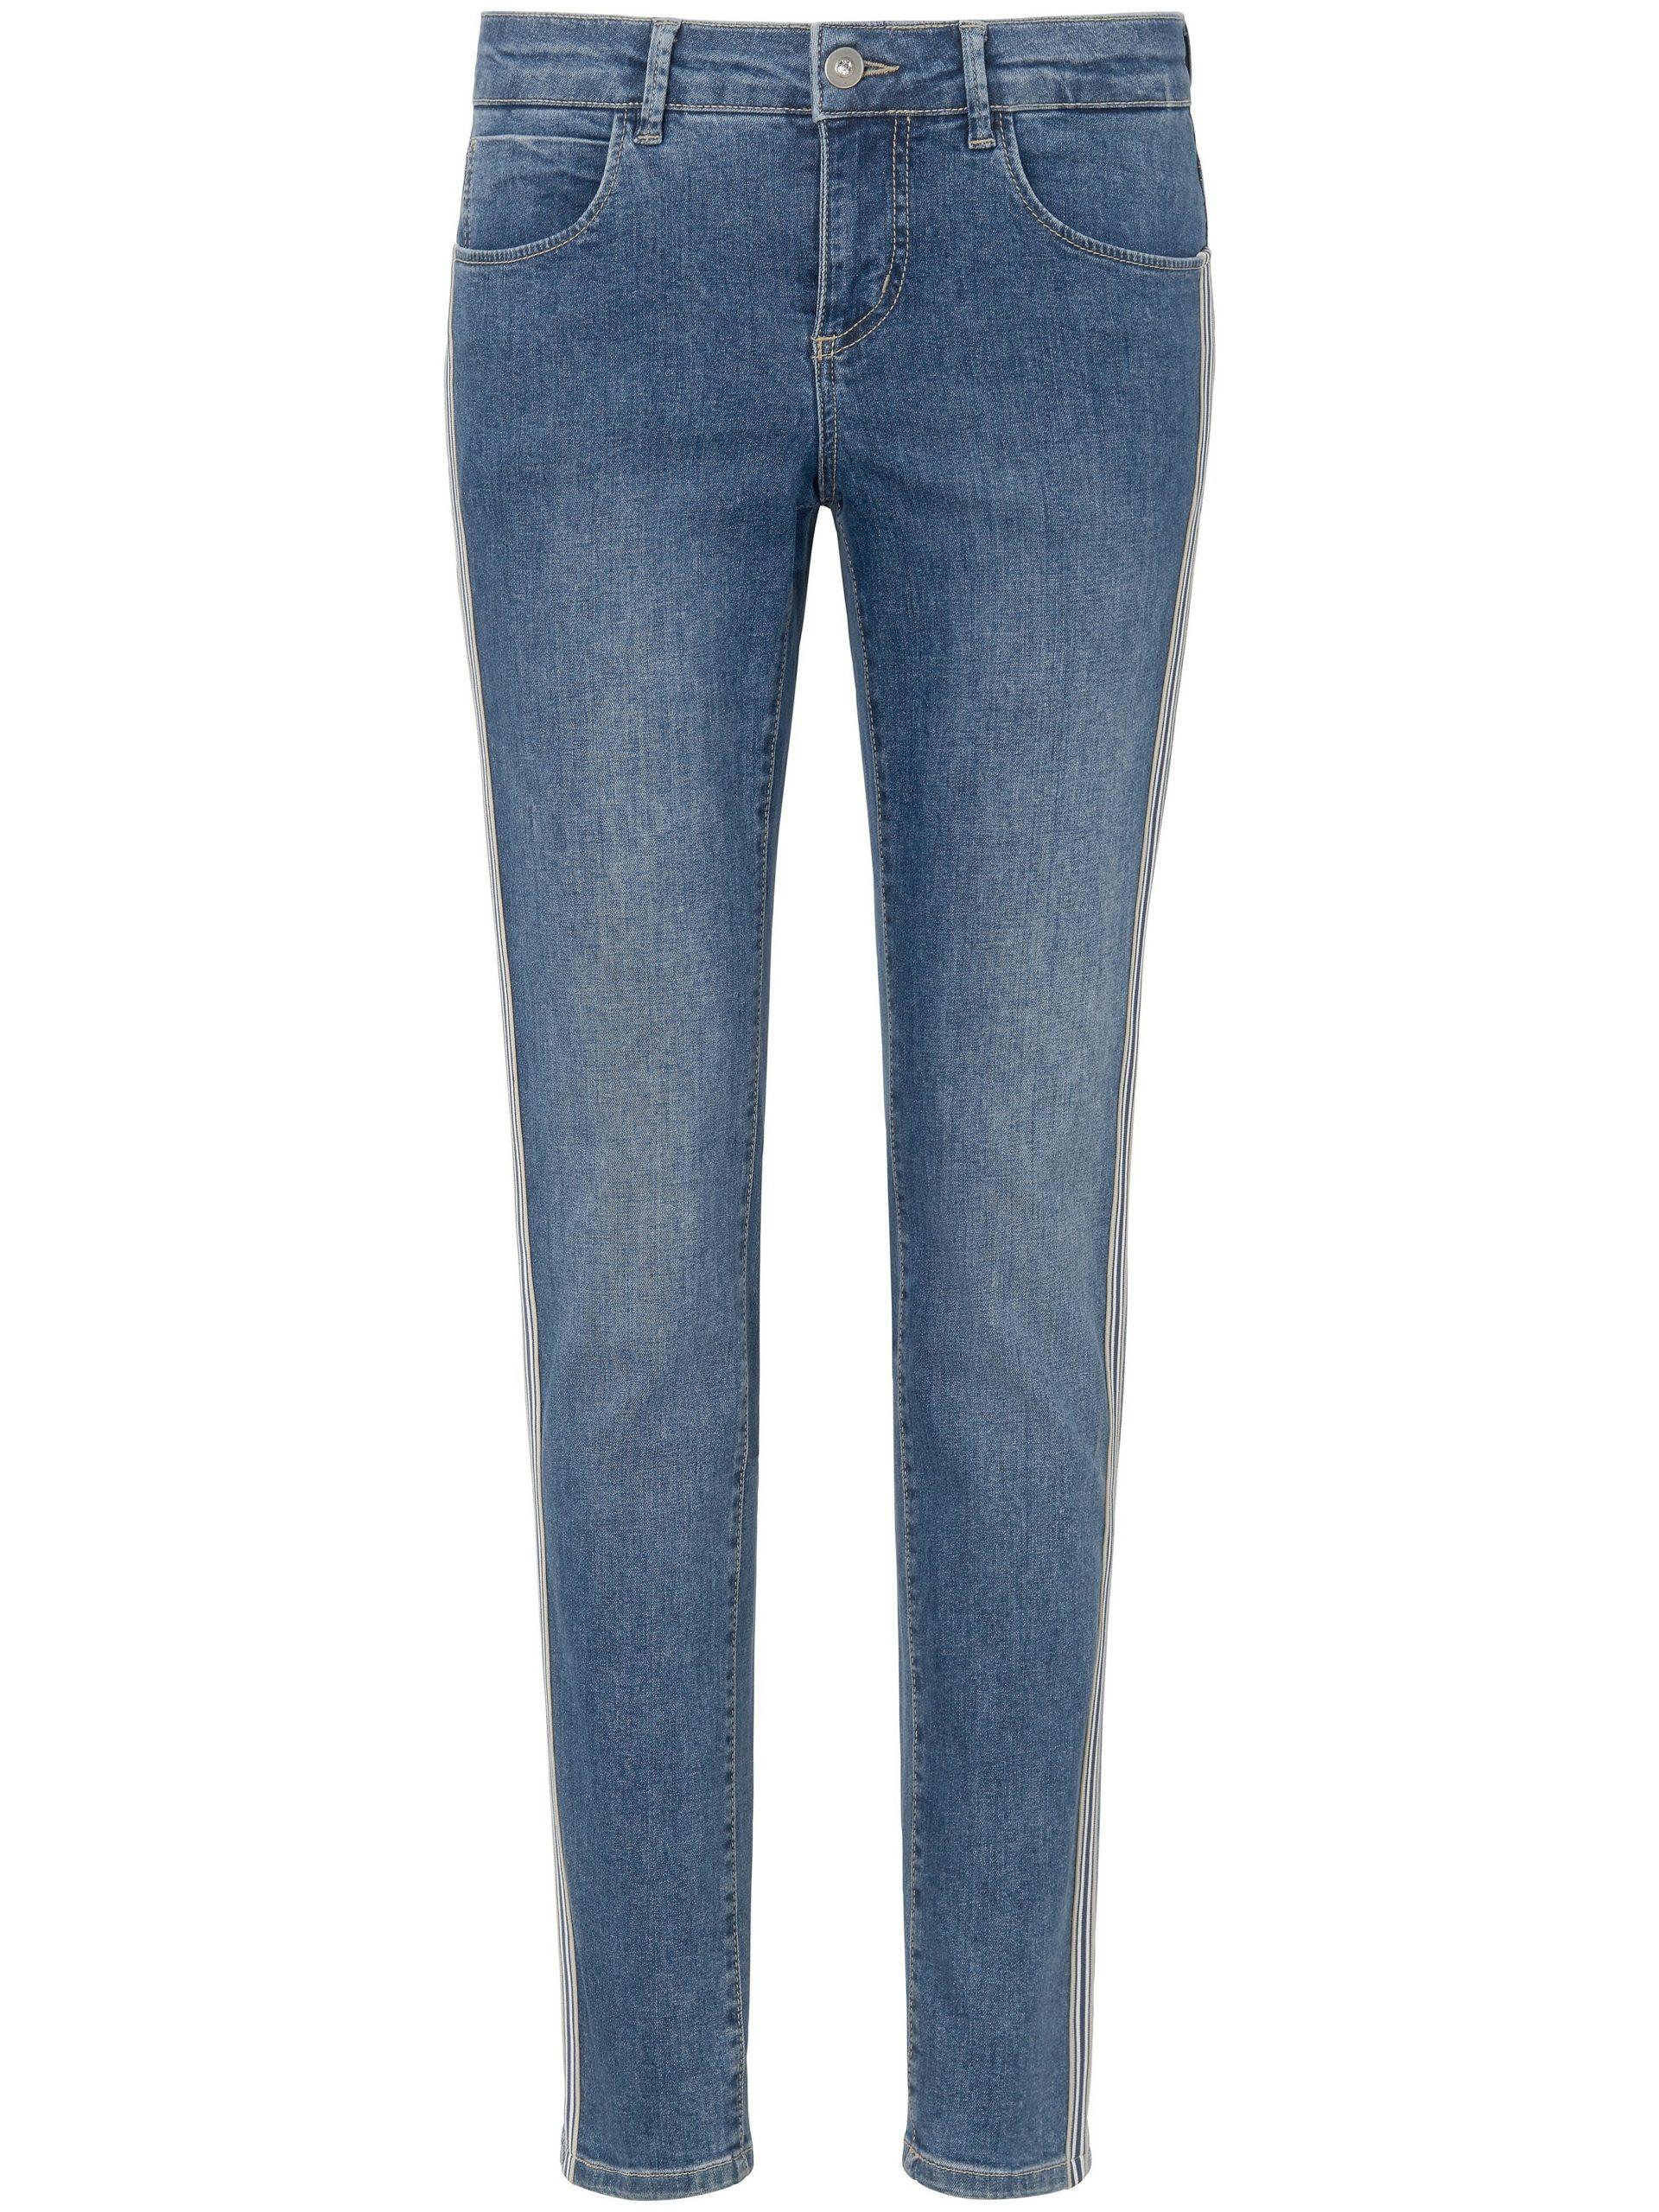 Jeans Van DAY.LIKE denim Kopen